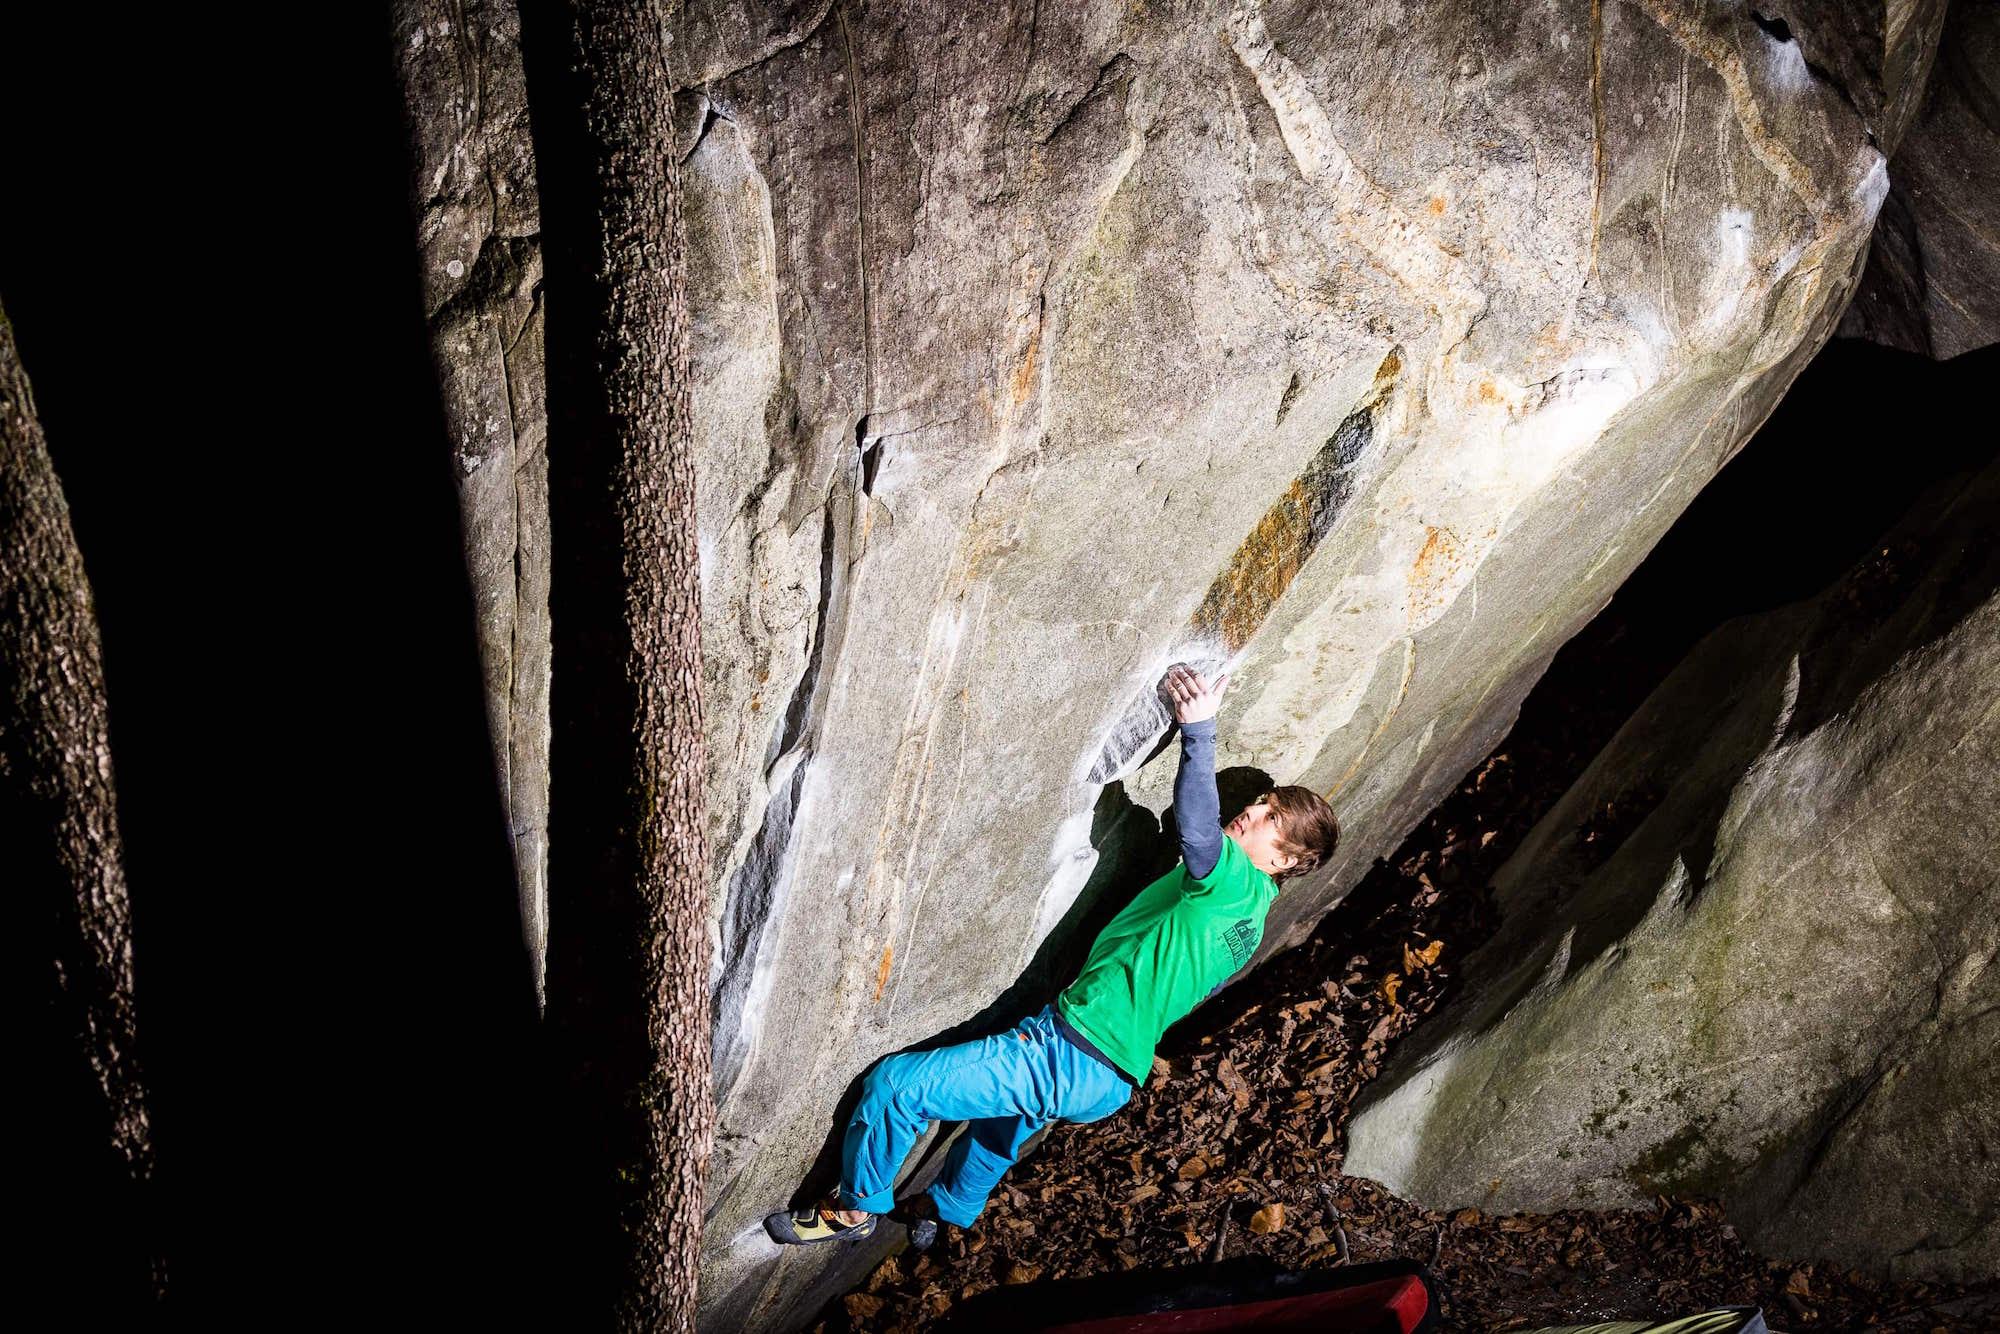 FrictionLabs Athlete Christof Rauch climbs a boulder